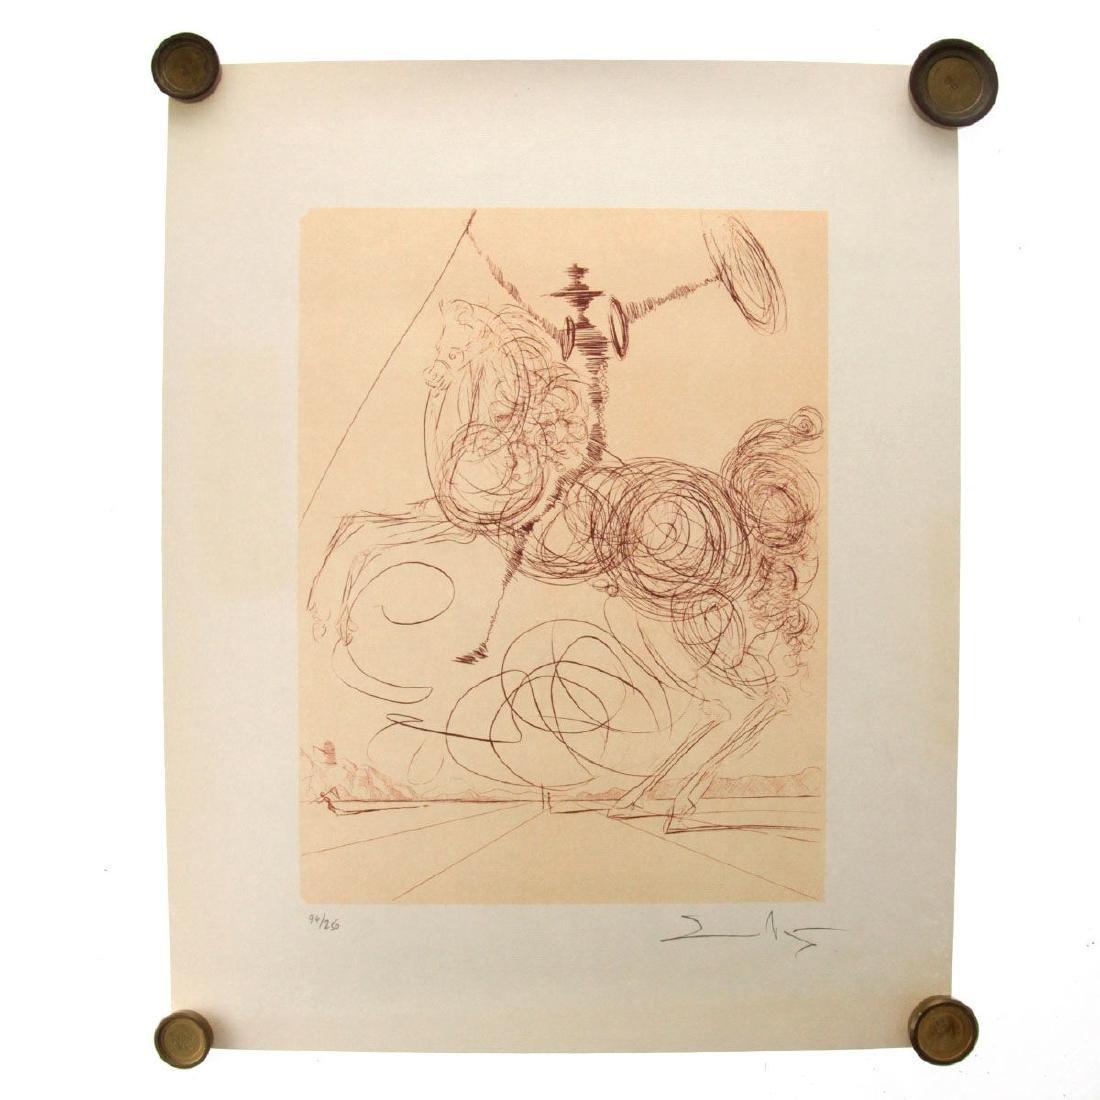 Salvador Dali - Don Quichotte (Quixote), Signed - 2